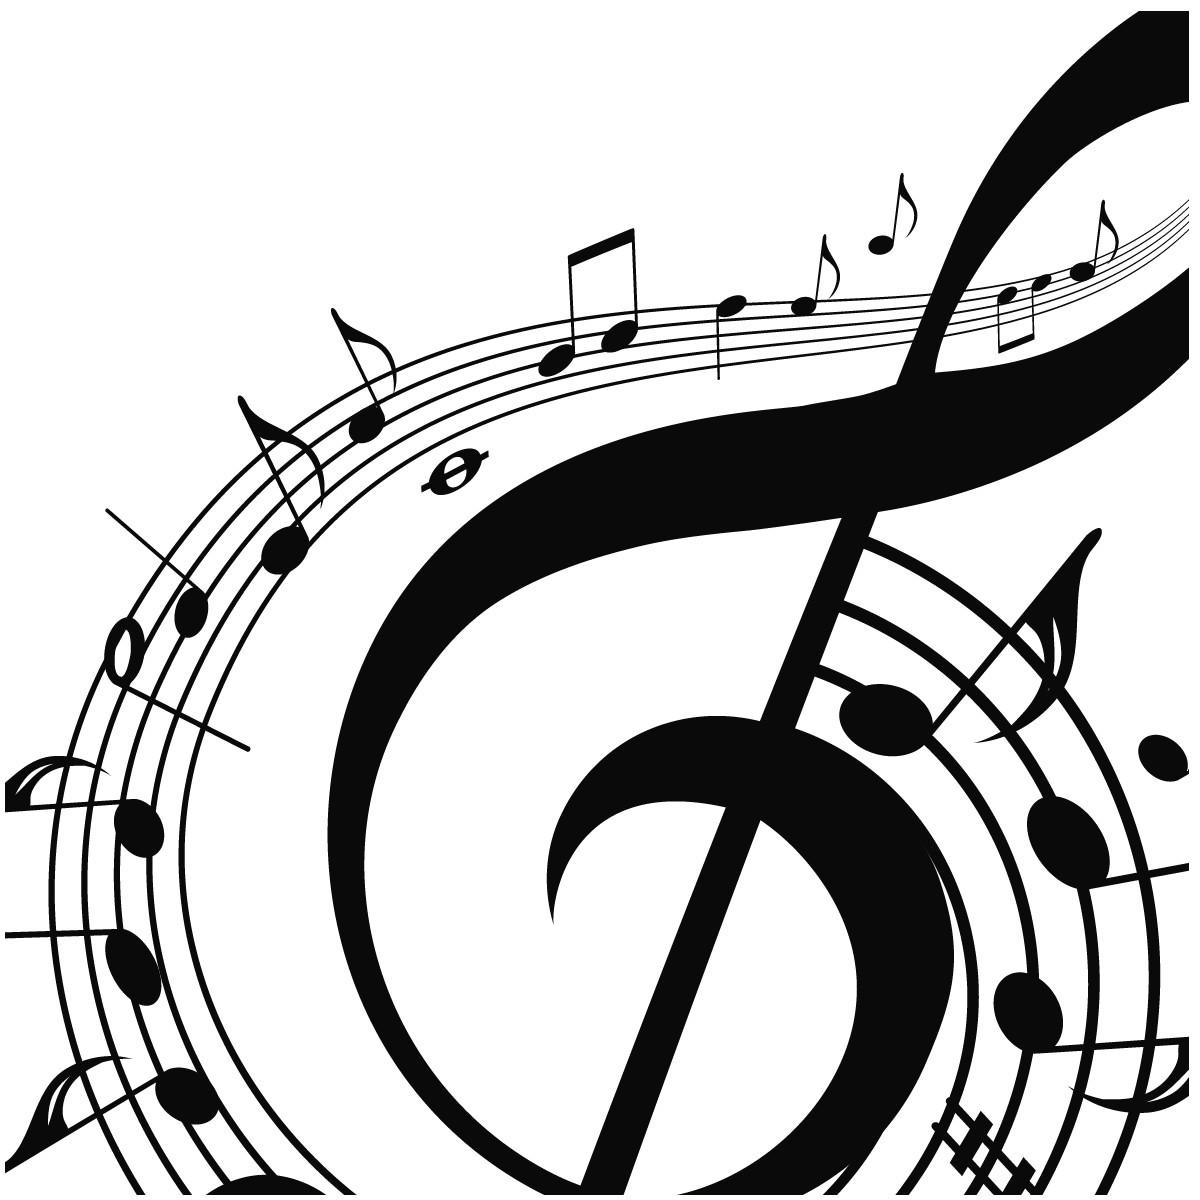 Black Music Notes